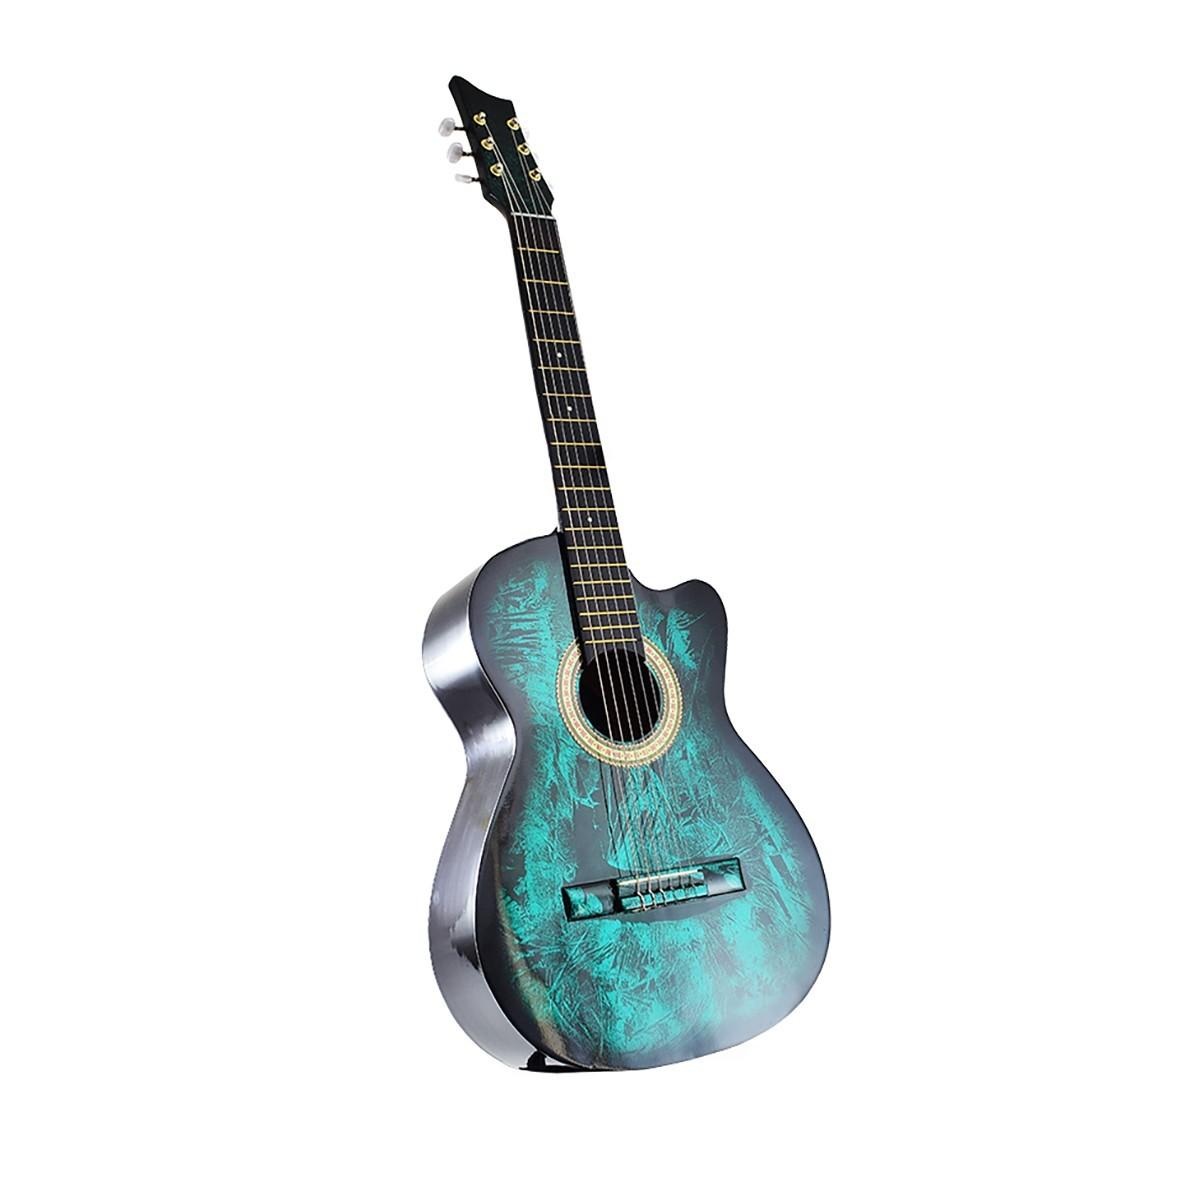 Guitarra acustica la clasica finas maderas asesoria luthier for Luthier guitarra electrica